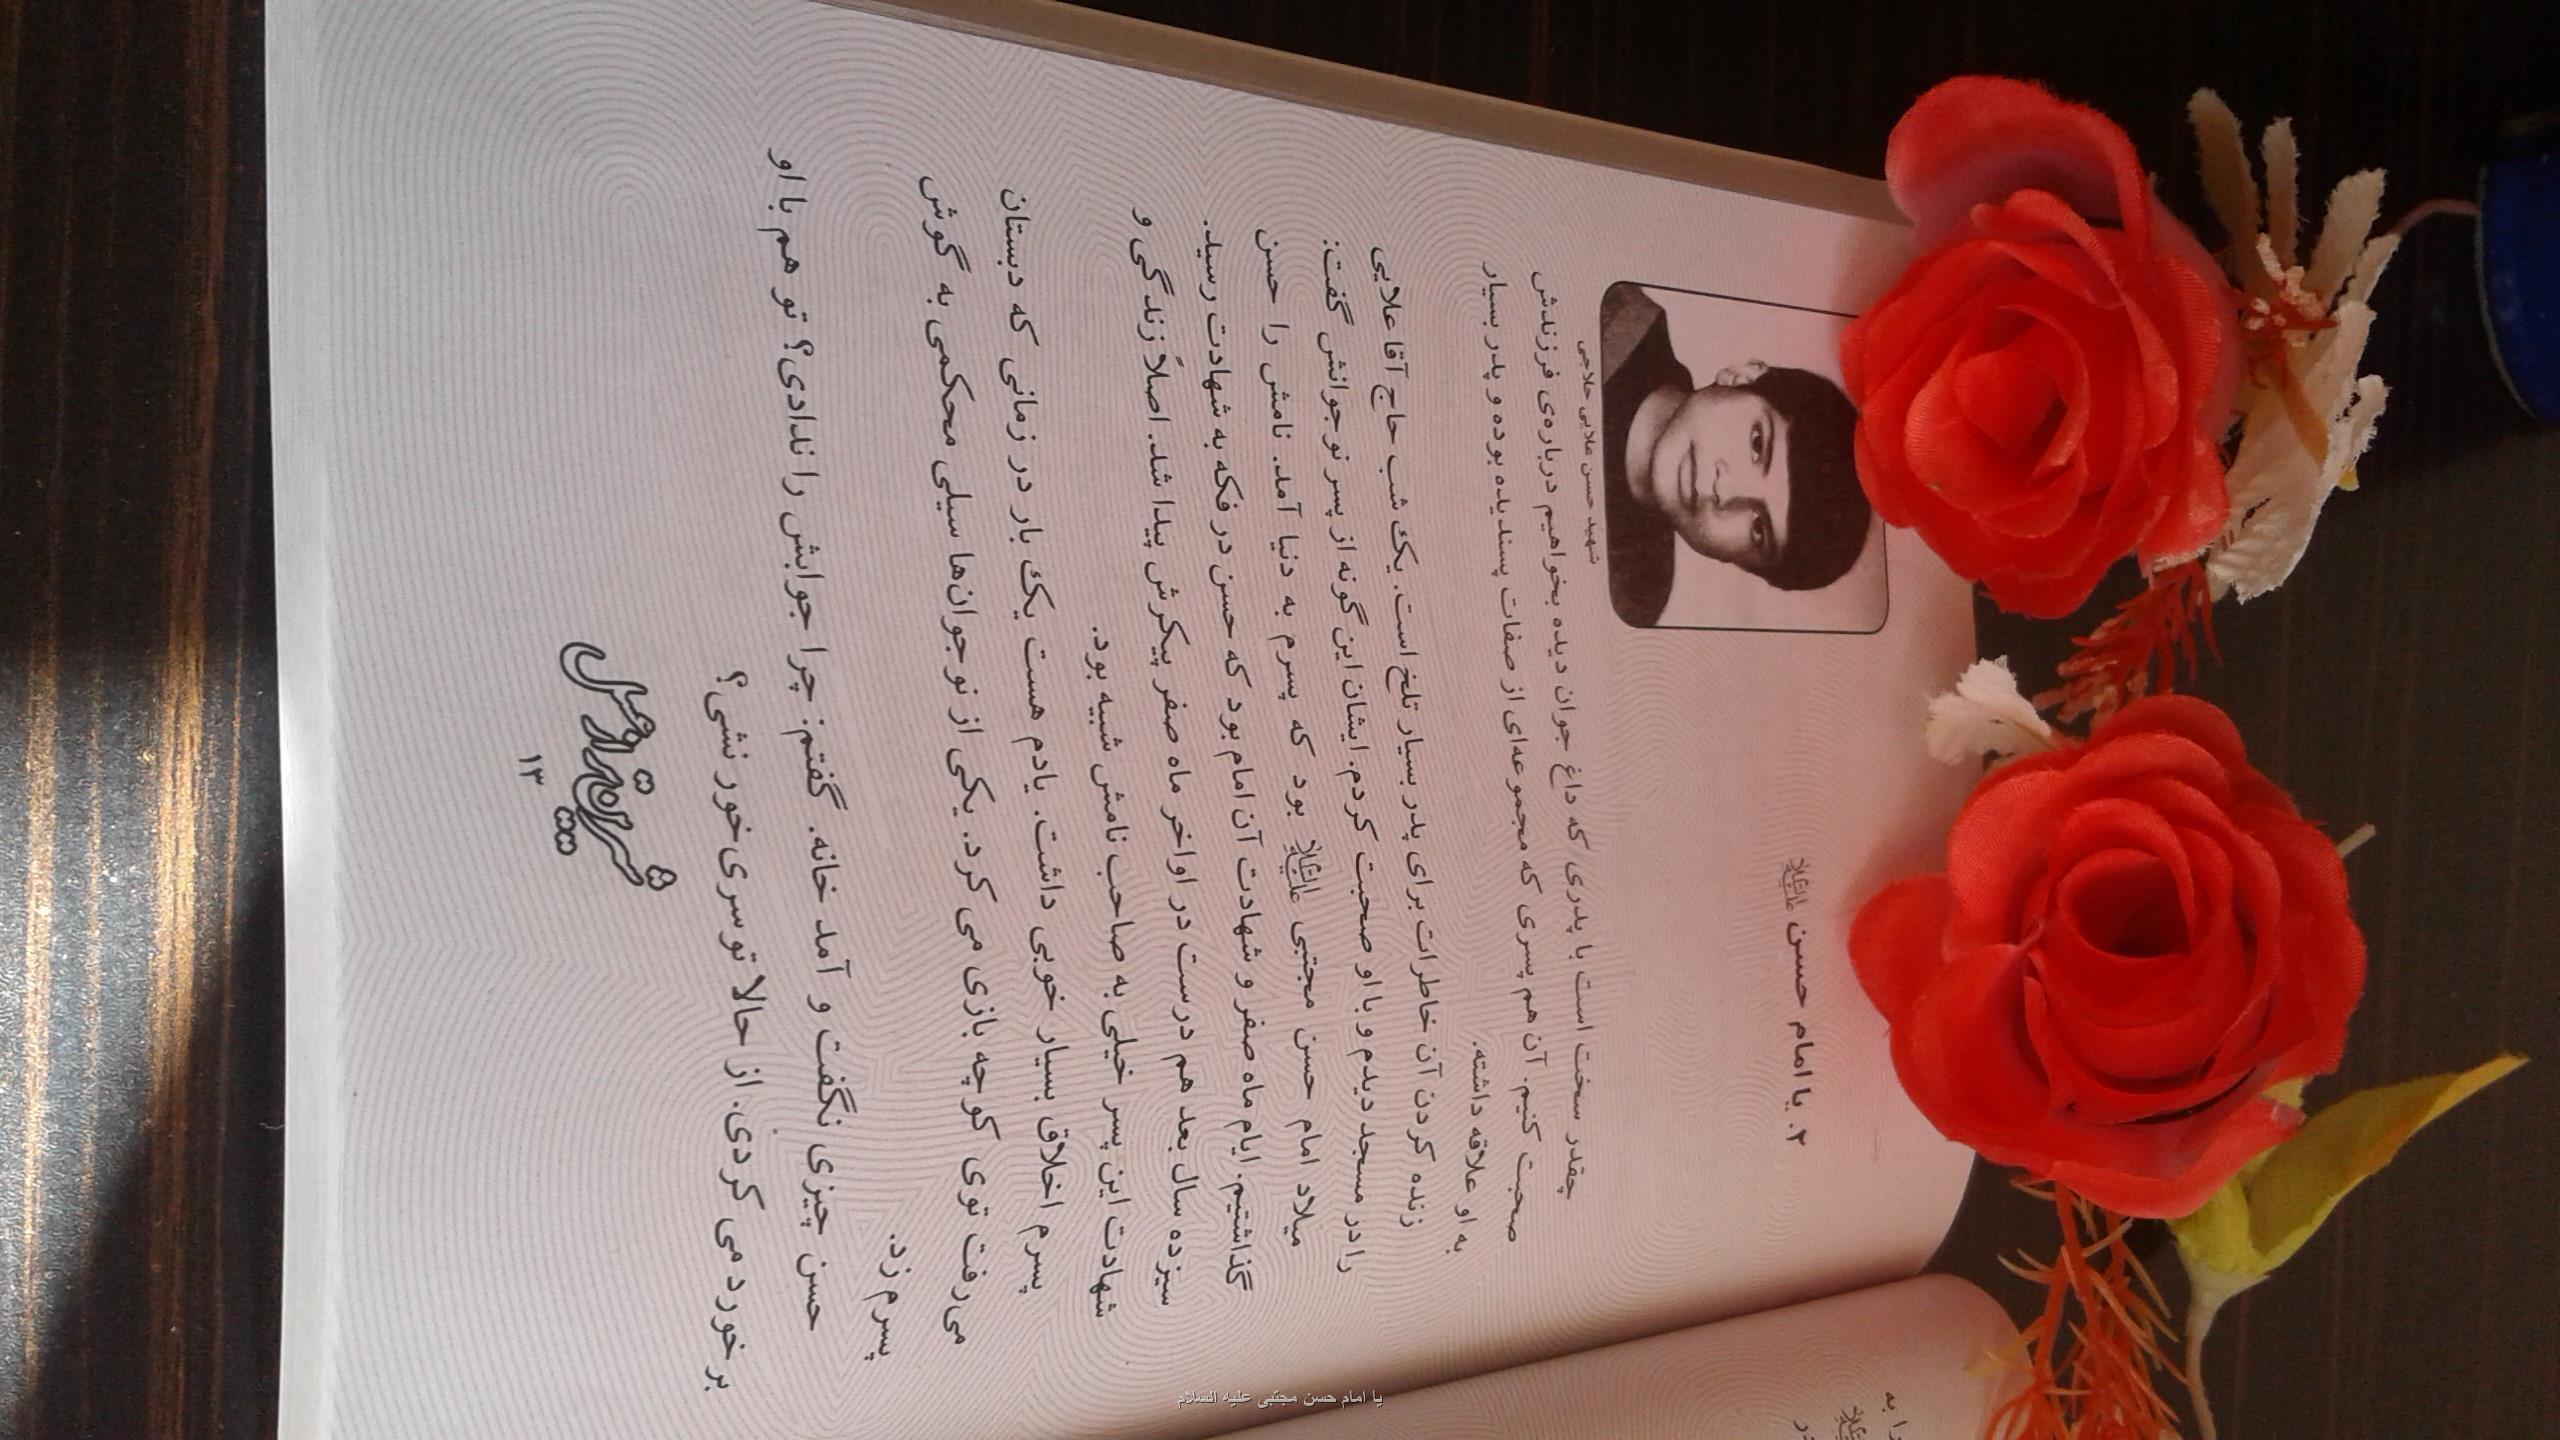 یاامام حسن مجتبی علیه السلام....شهیدحسن علایی